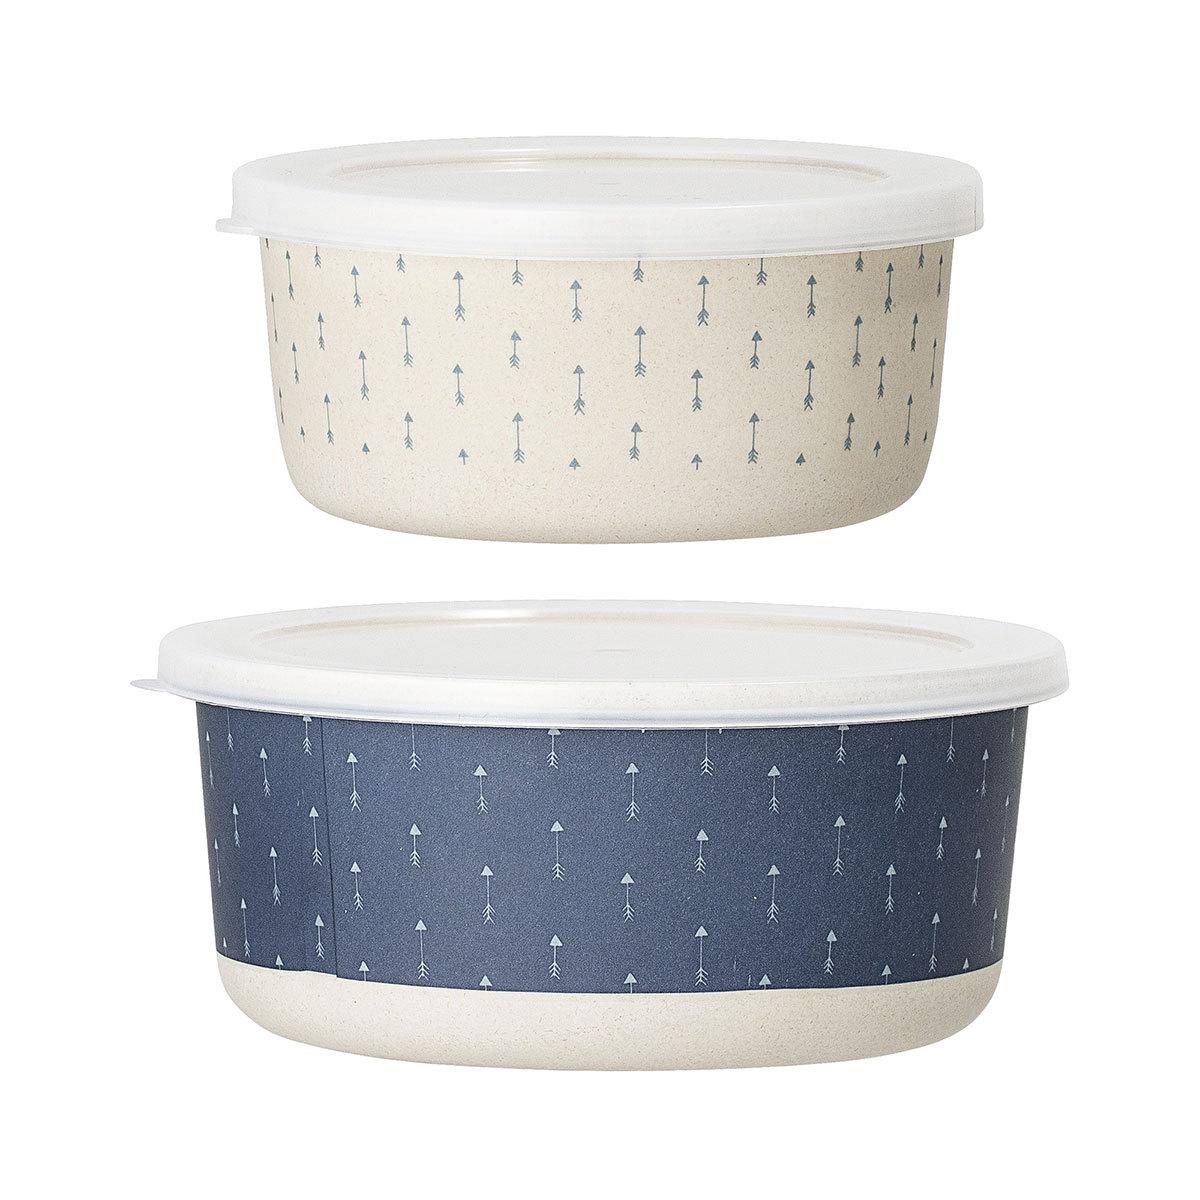 Vaisselle & Couvert Lot de 2 Box Bamboo Bleu Lot de 2 Box Bamboo Bleu